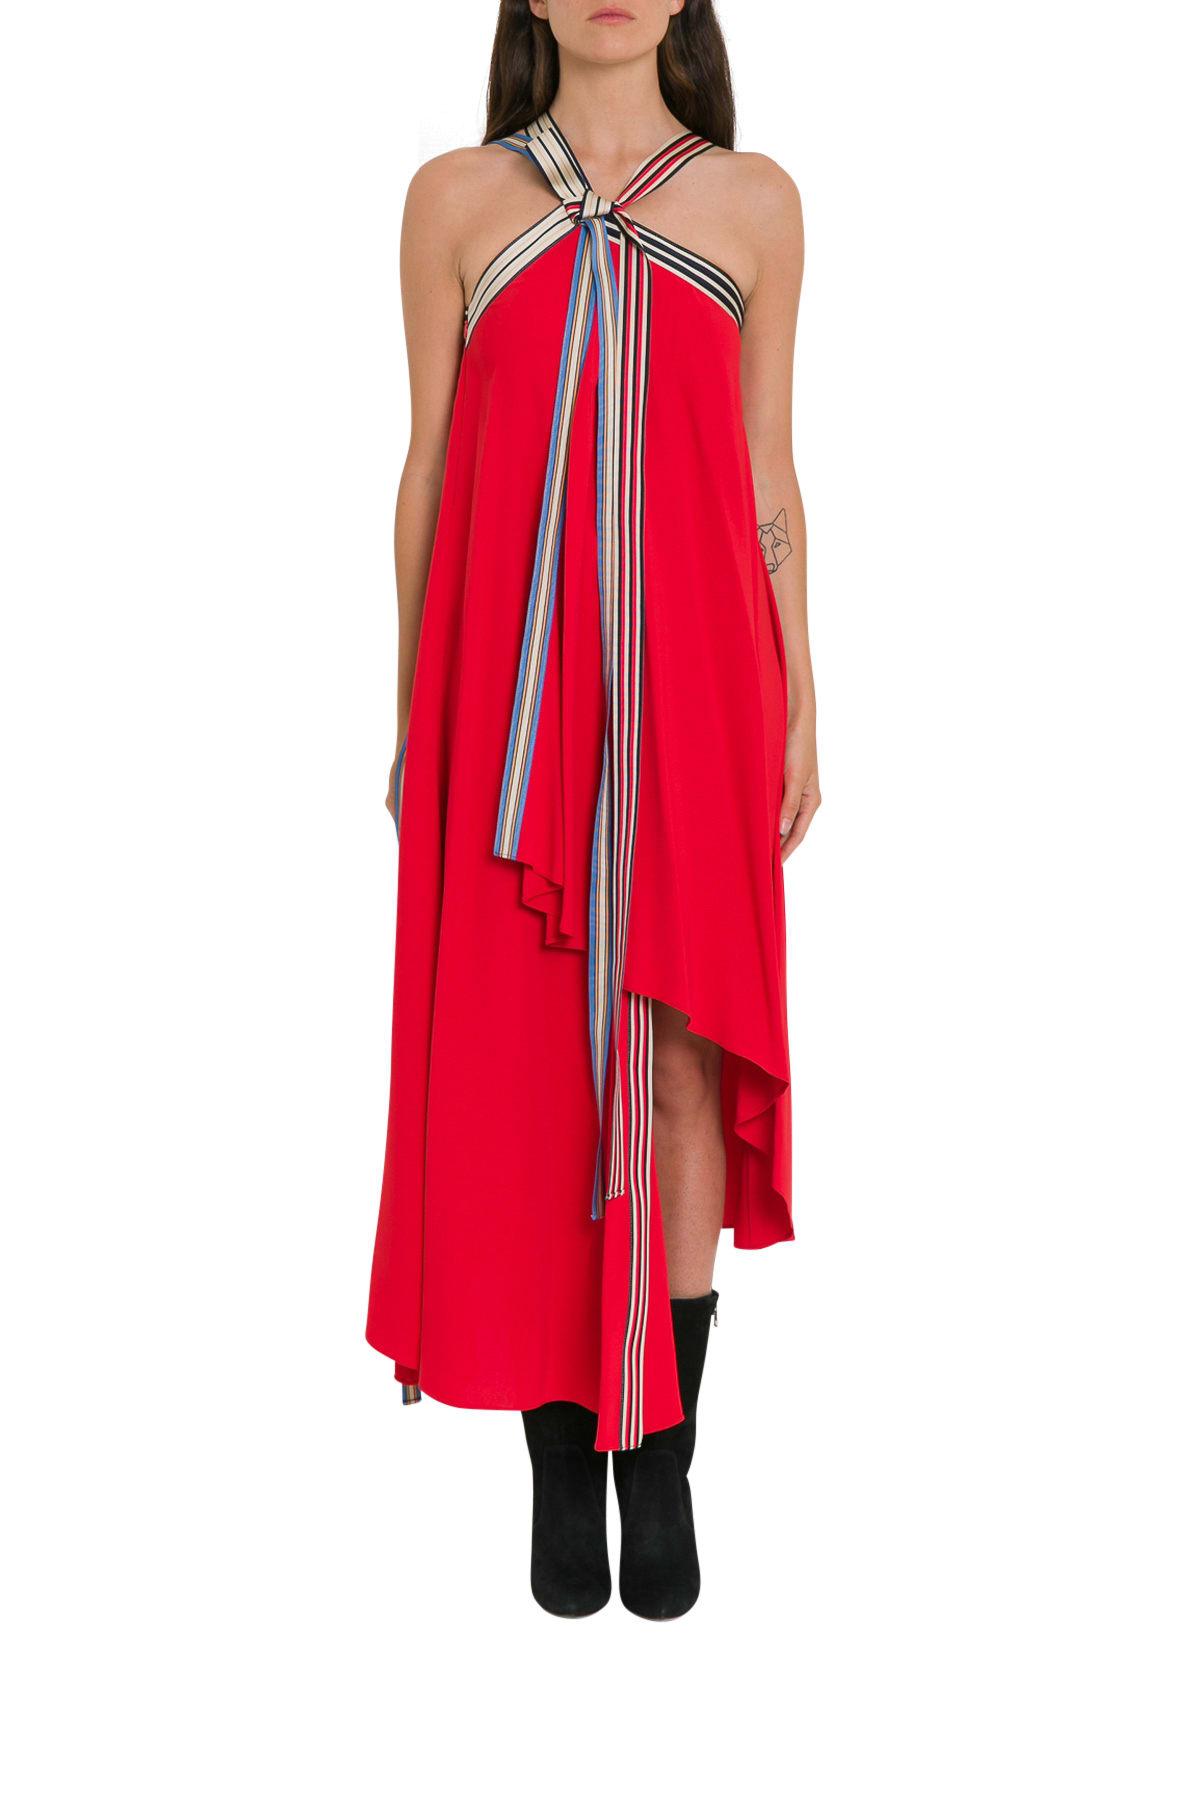 MONSE Grosgrain Tie Midi Dress